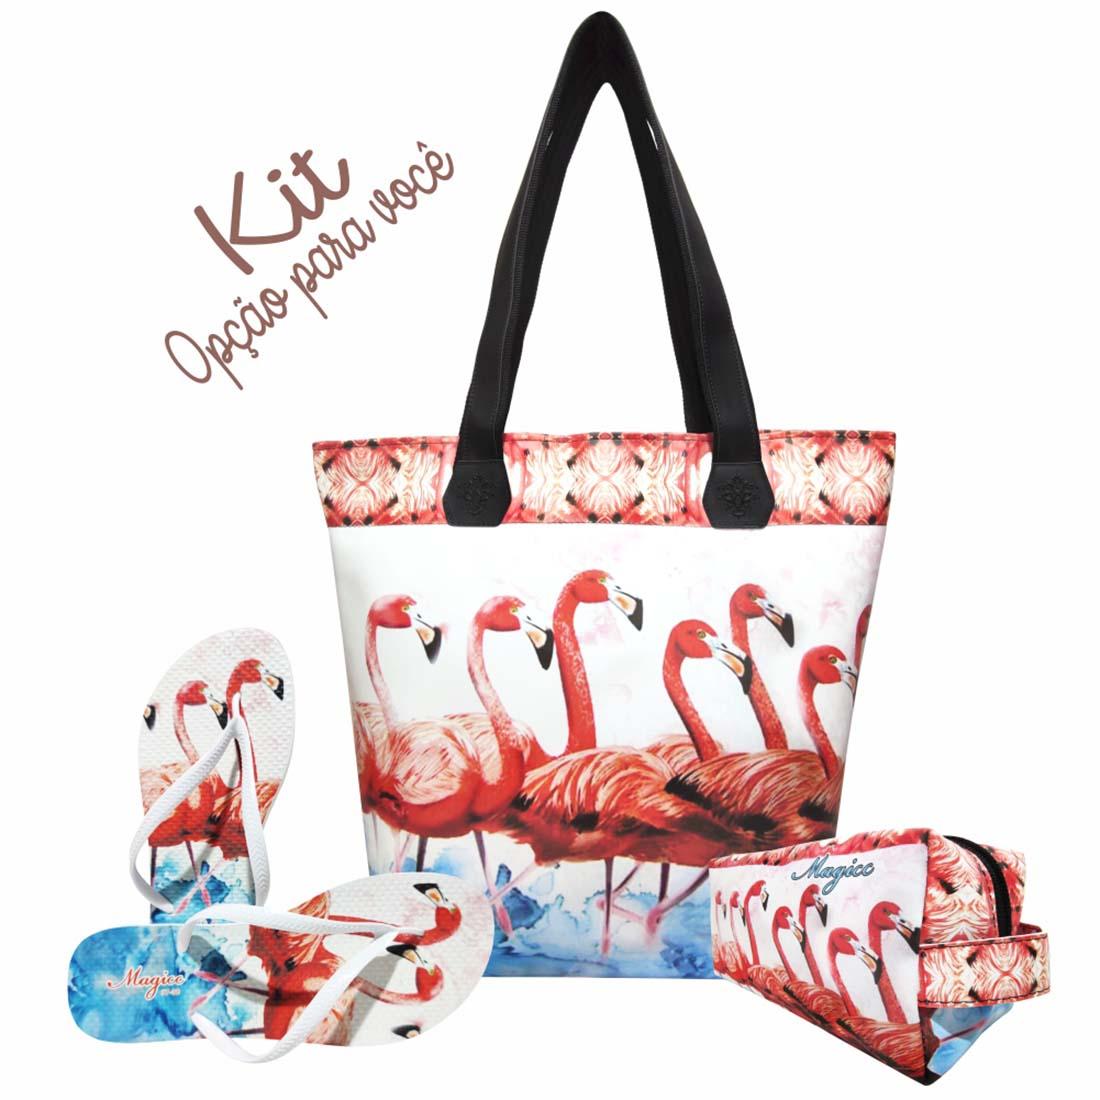 Necessaire Tropical Feminina Flamingos Vermelhos, Magicc